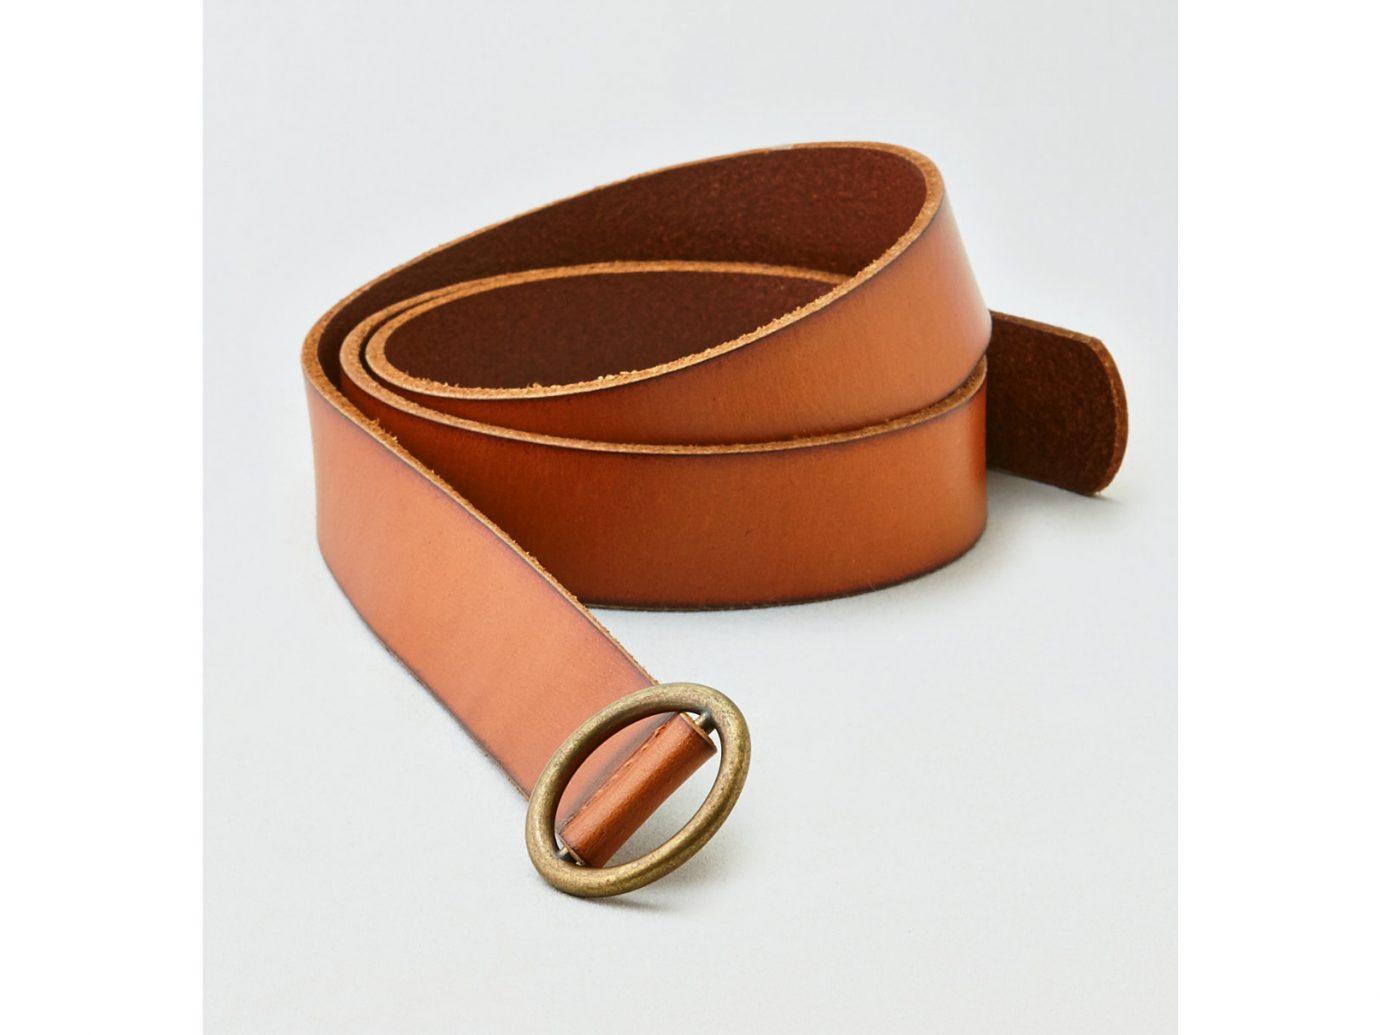 American Eagle O-Ring Belt